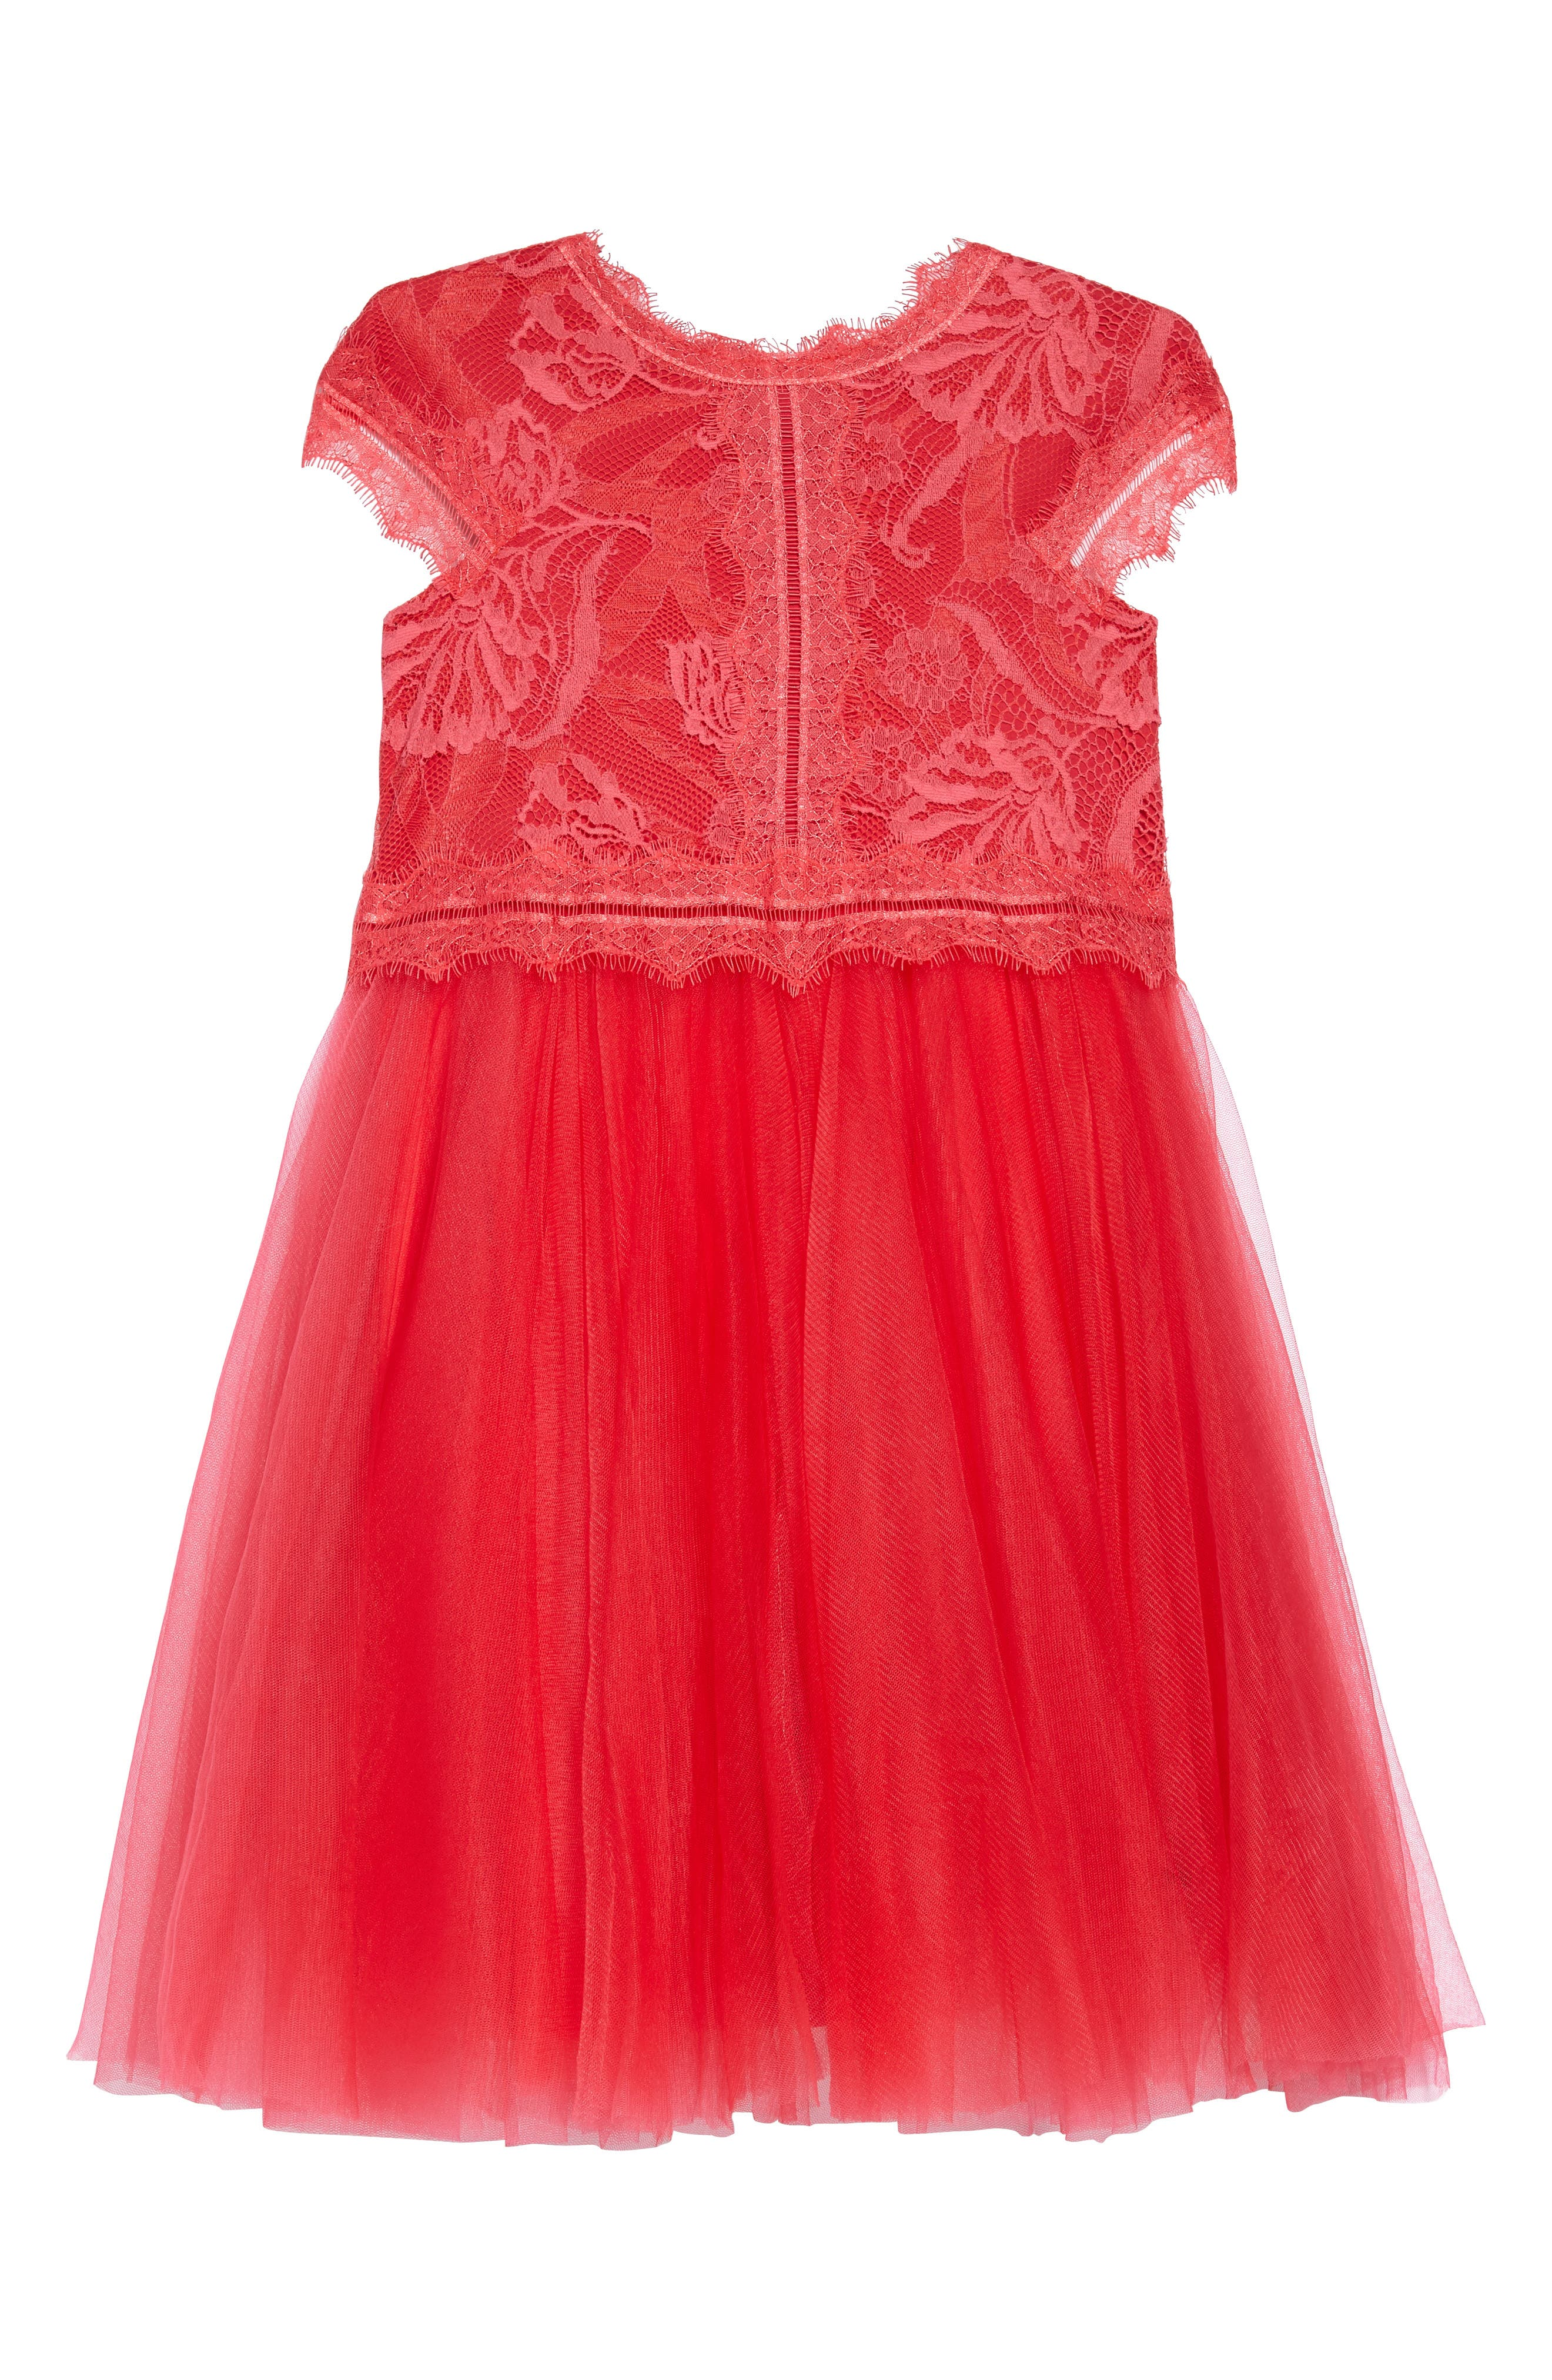 Floral Lace Tulle Dress,                             Main thumbnail 1, color,